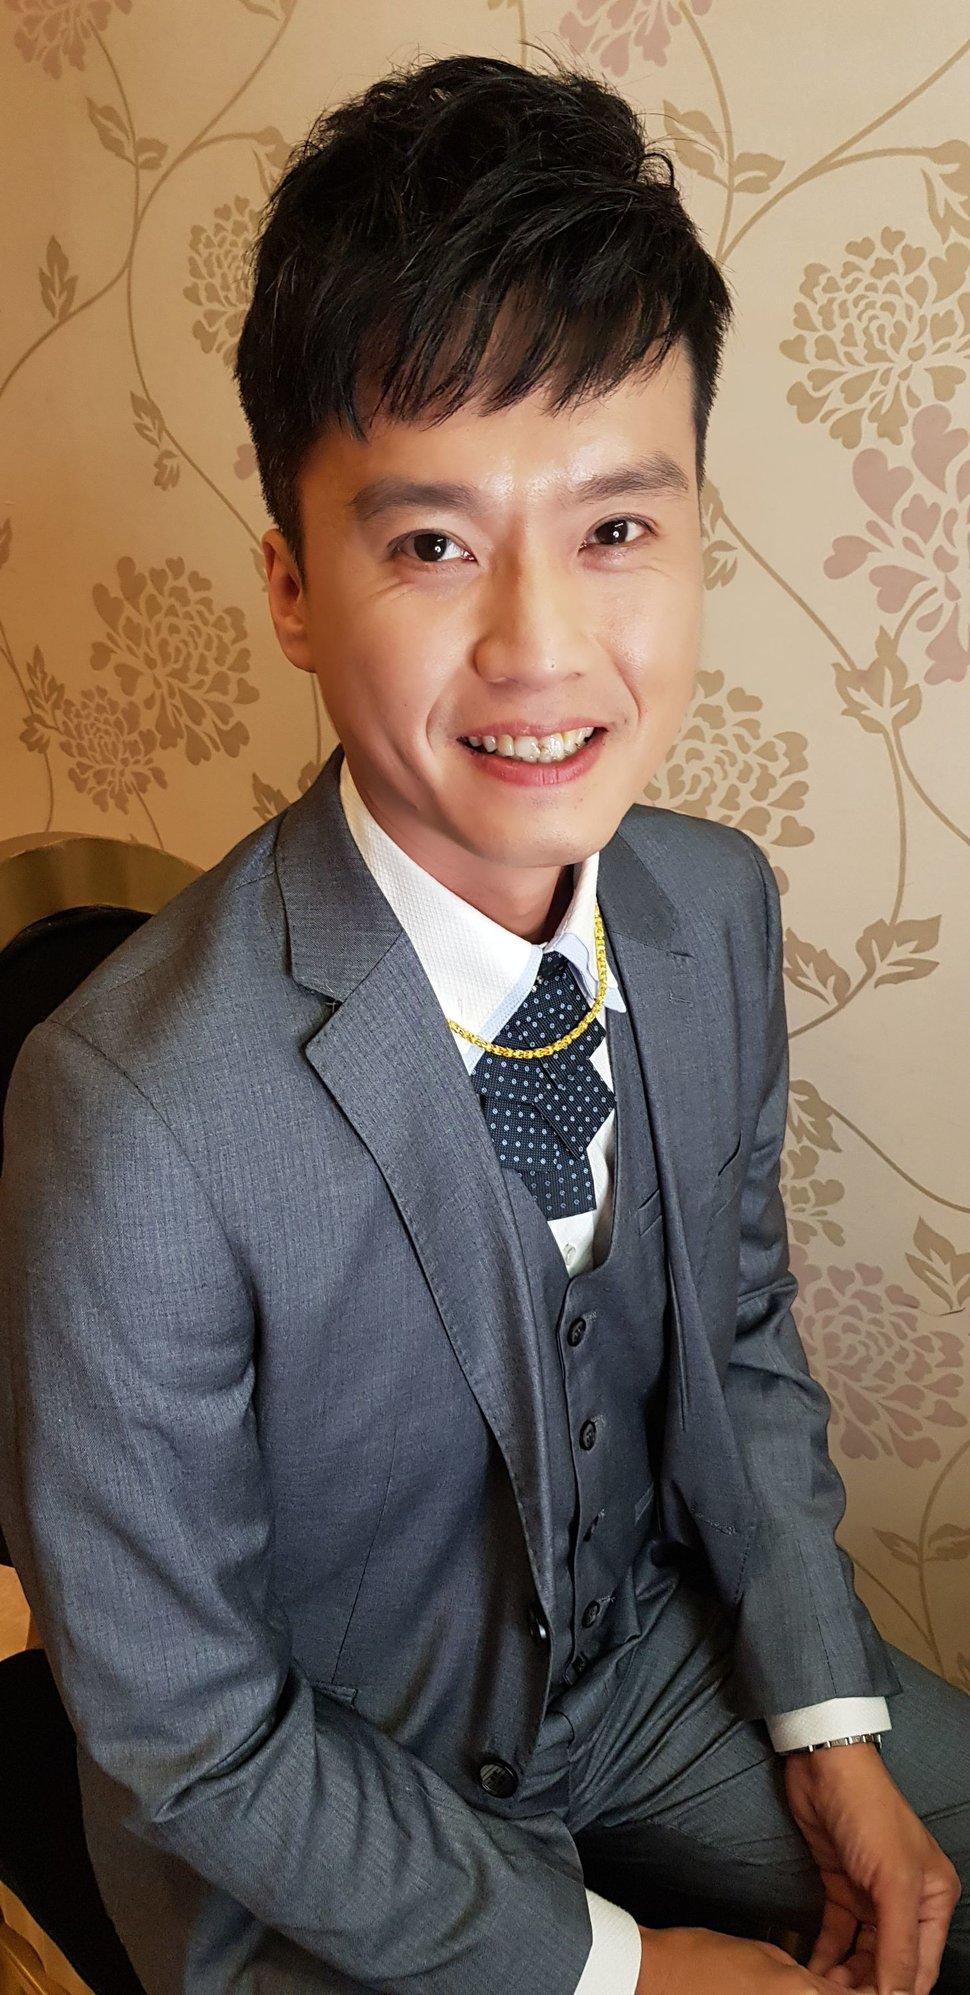 PSFix_20191012_134121 - 漾時尚婚禮整體造型總監蘇蓉蓉《結婚吧》